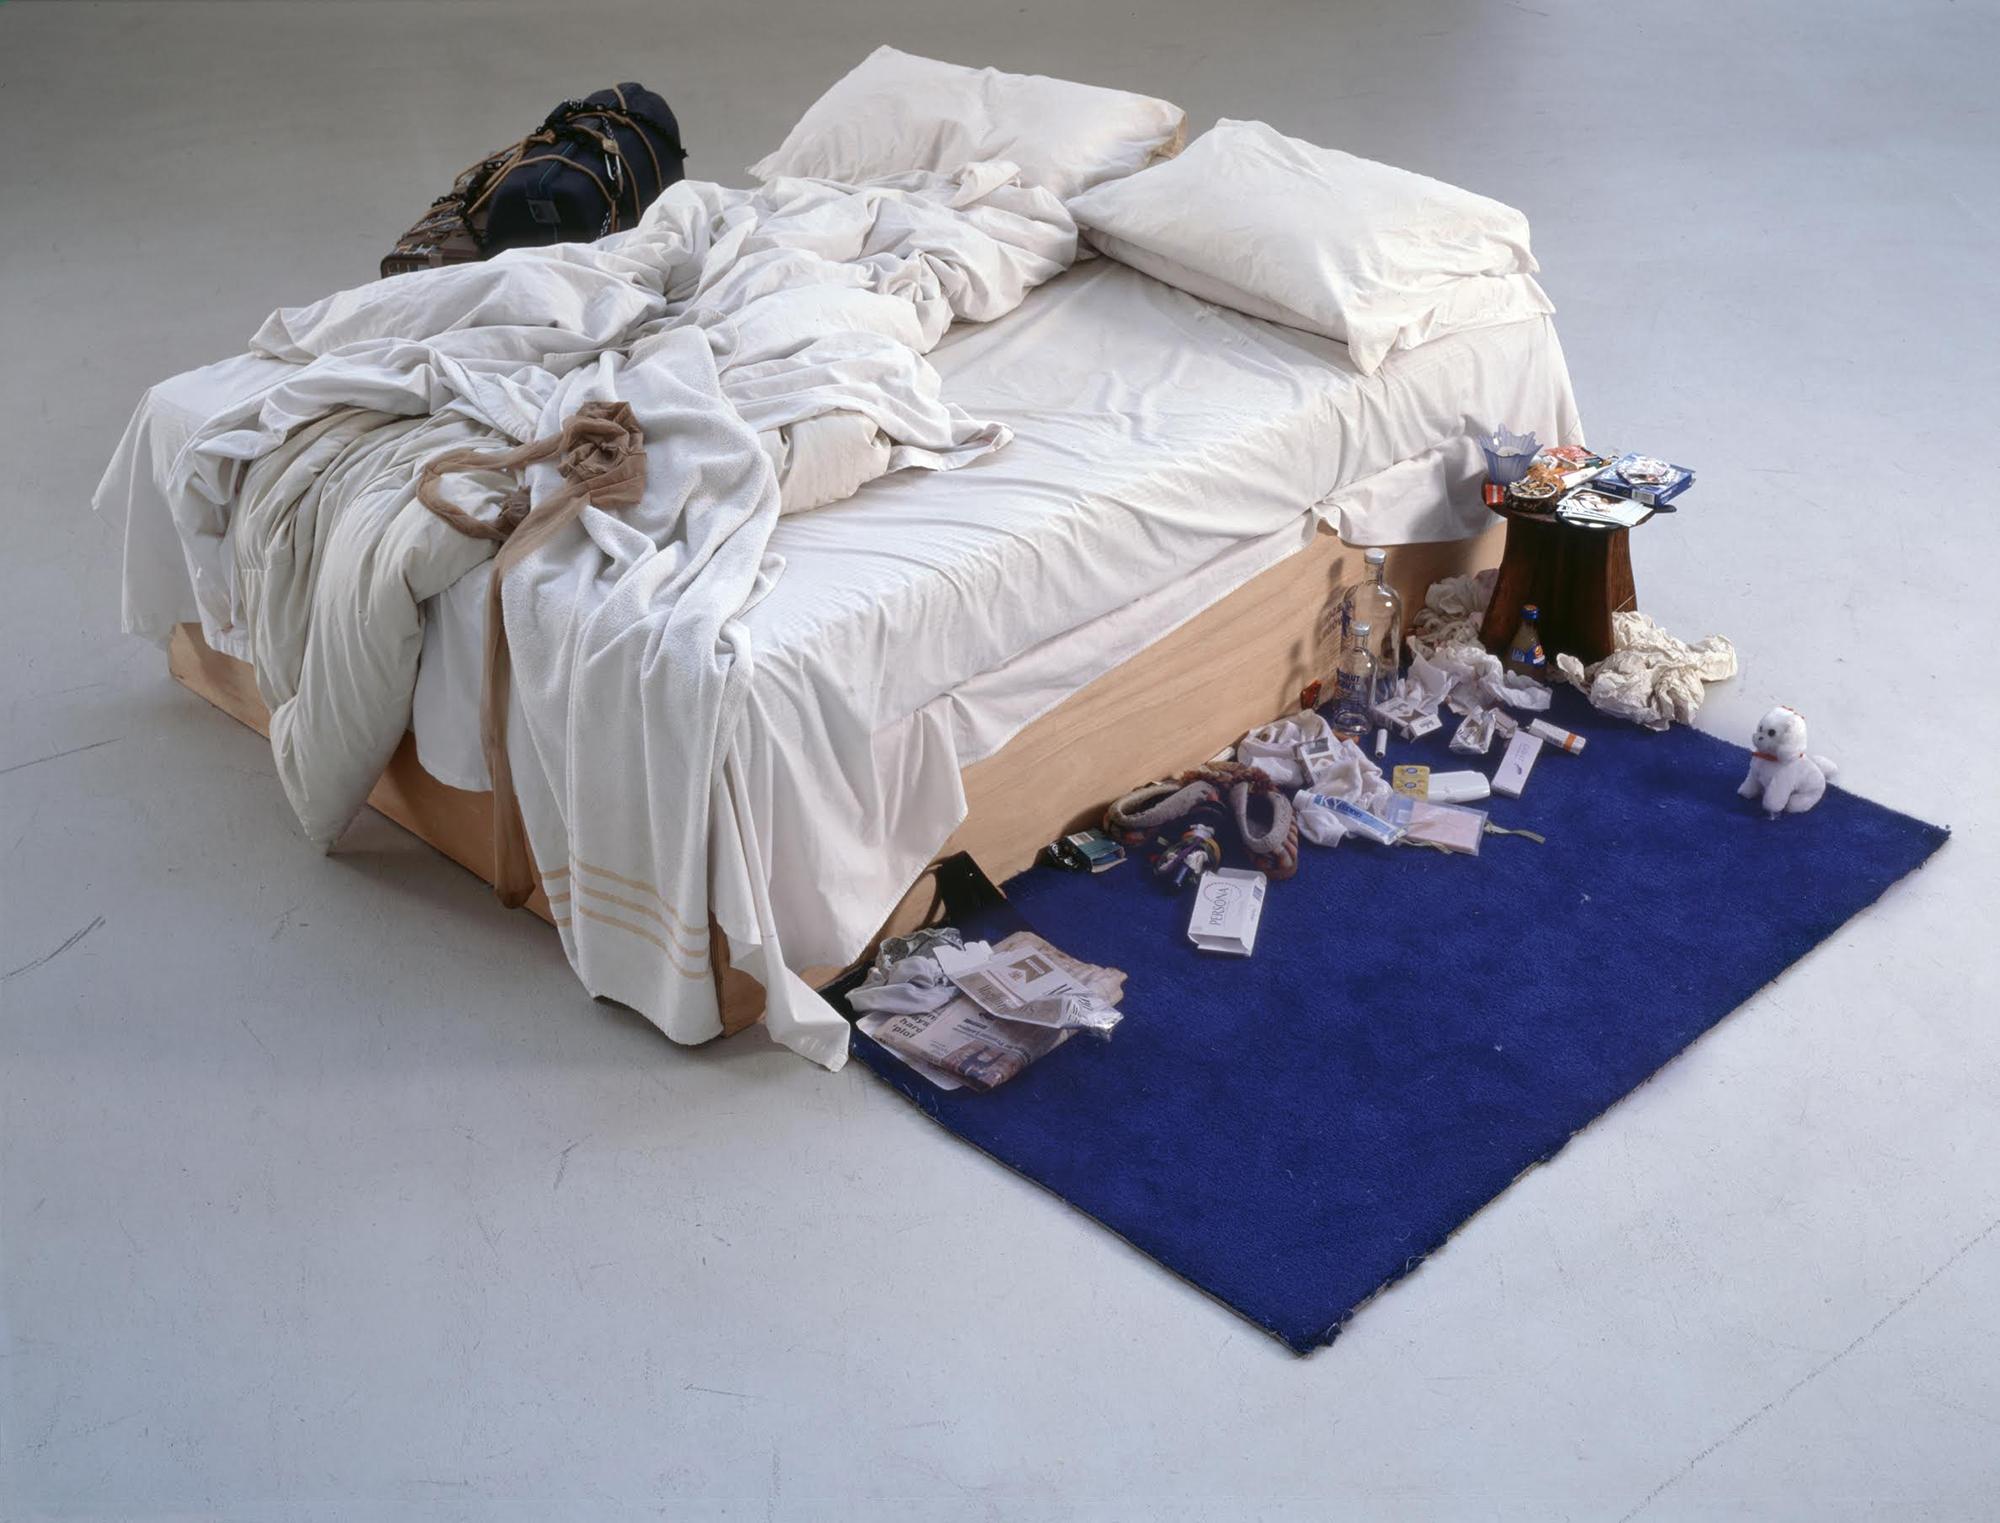 Tracey Emin, 'My Bed' (1968), Tate, © Tracey Emin